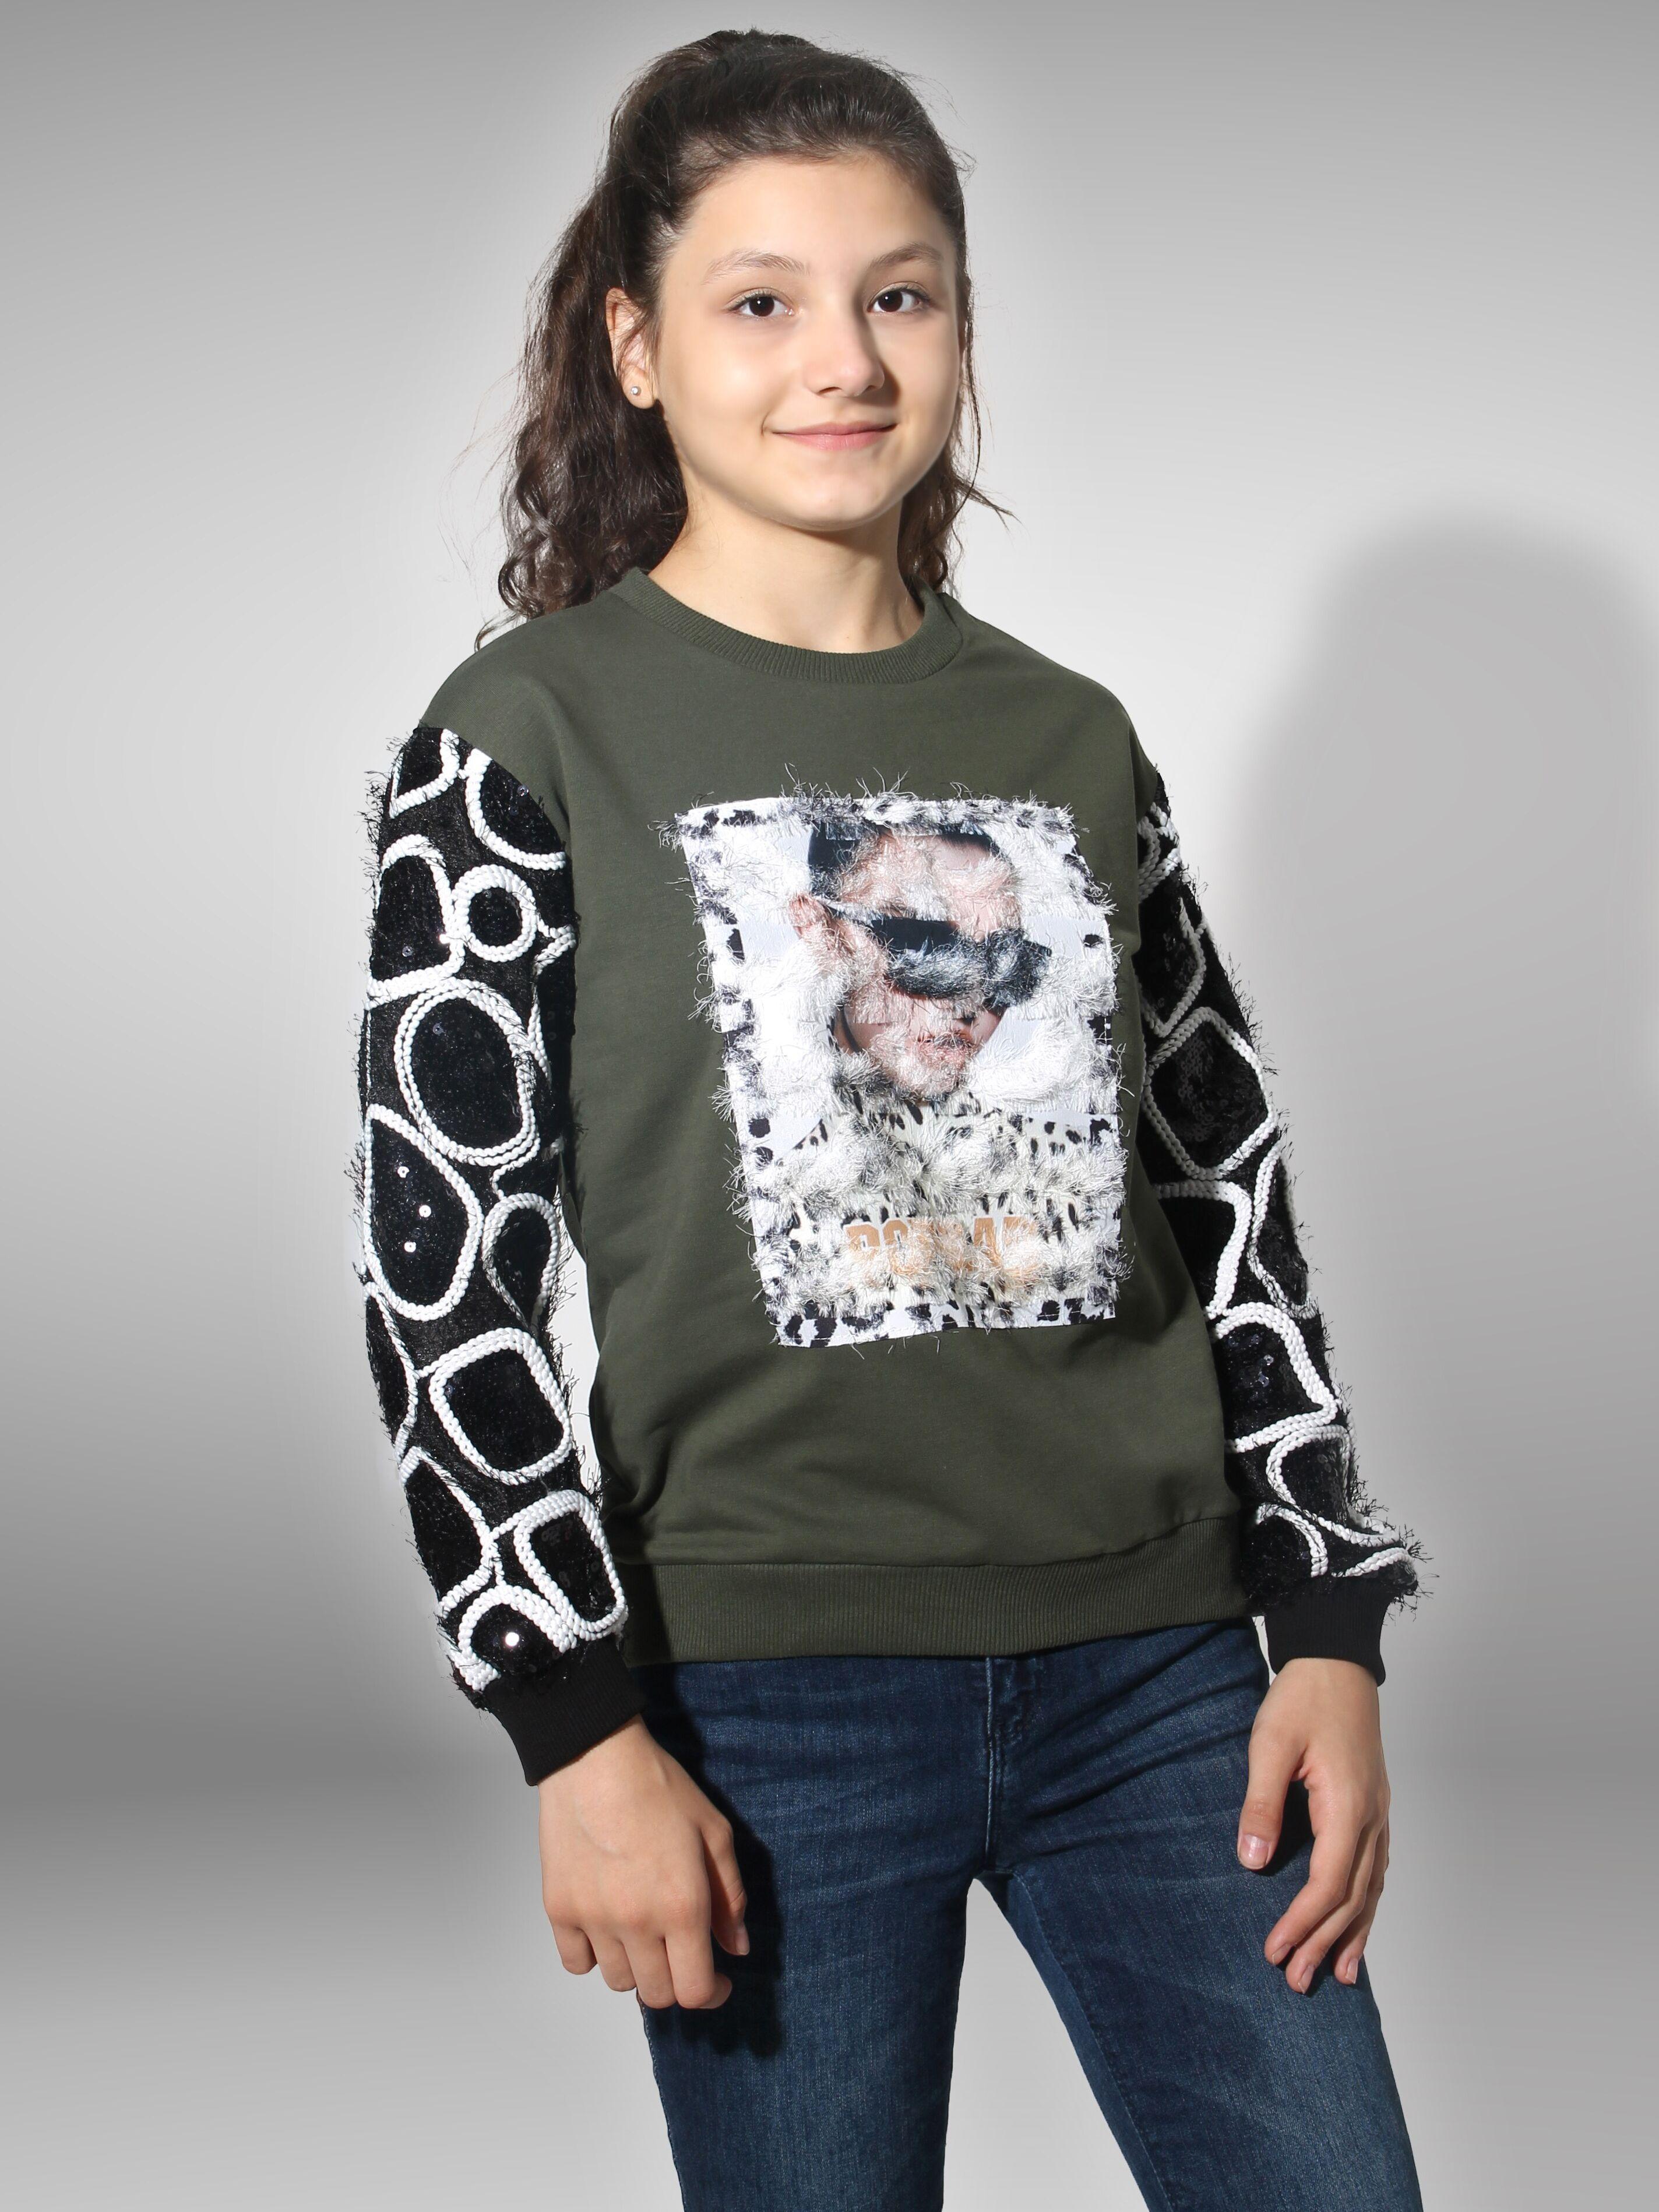 Lizmosse-كنزة مطرزة للأطفال والفتيات ، تصميم هندسي وشعر ، سترة مع ياقة دراجة ، لون مسحوق بورجوندي أزرق داكن ، صنع في تركيا 9 10 11 12 13 سنة